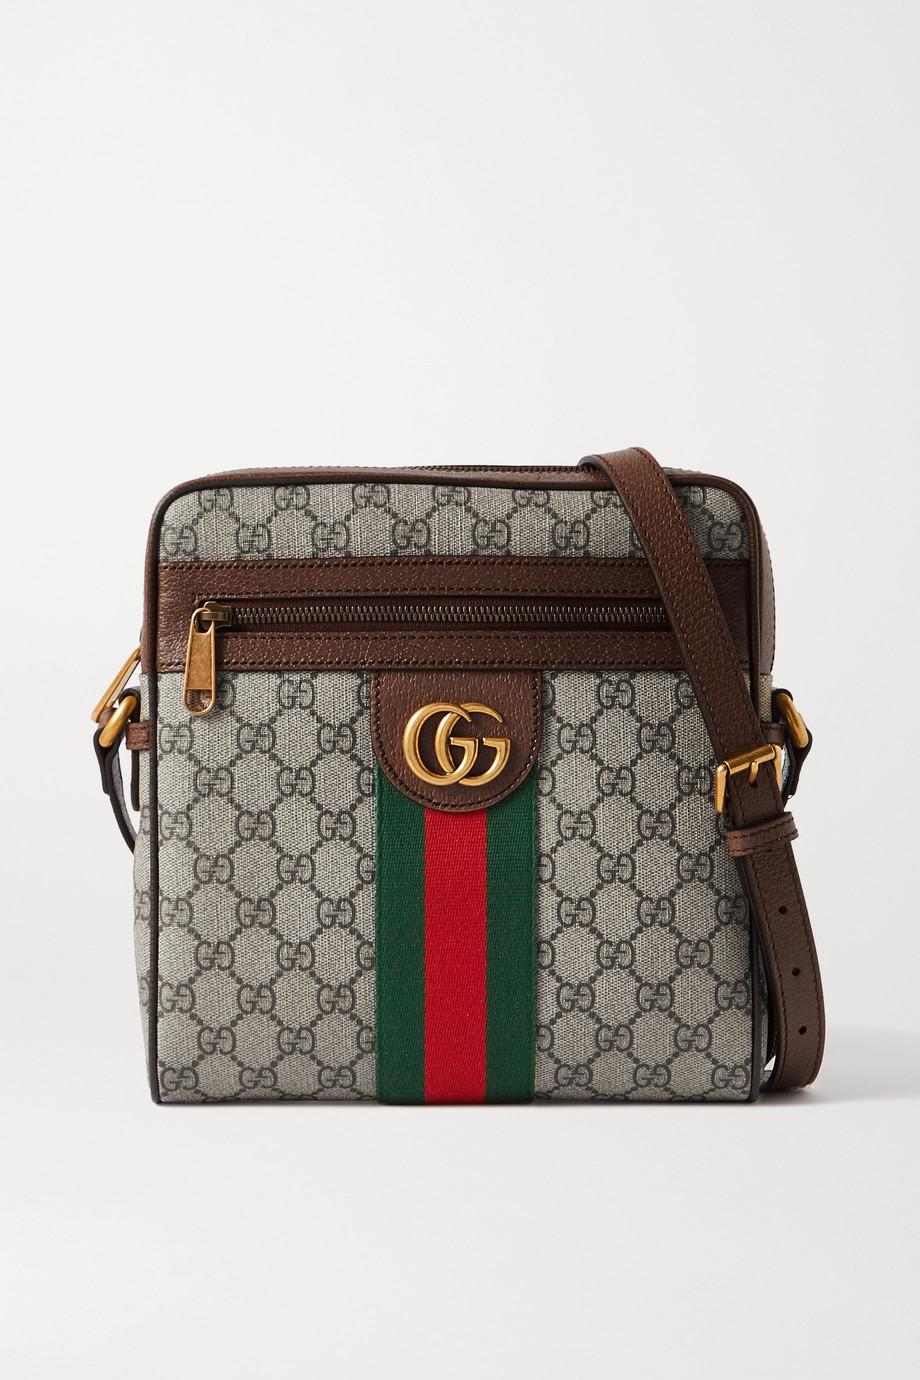 Gucci Ophidia 纹理皮革边饰印花涂层帆布小号单肩包